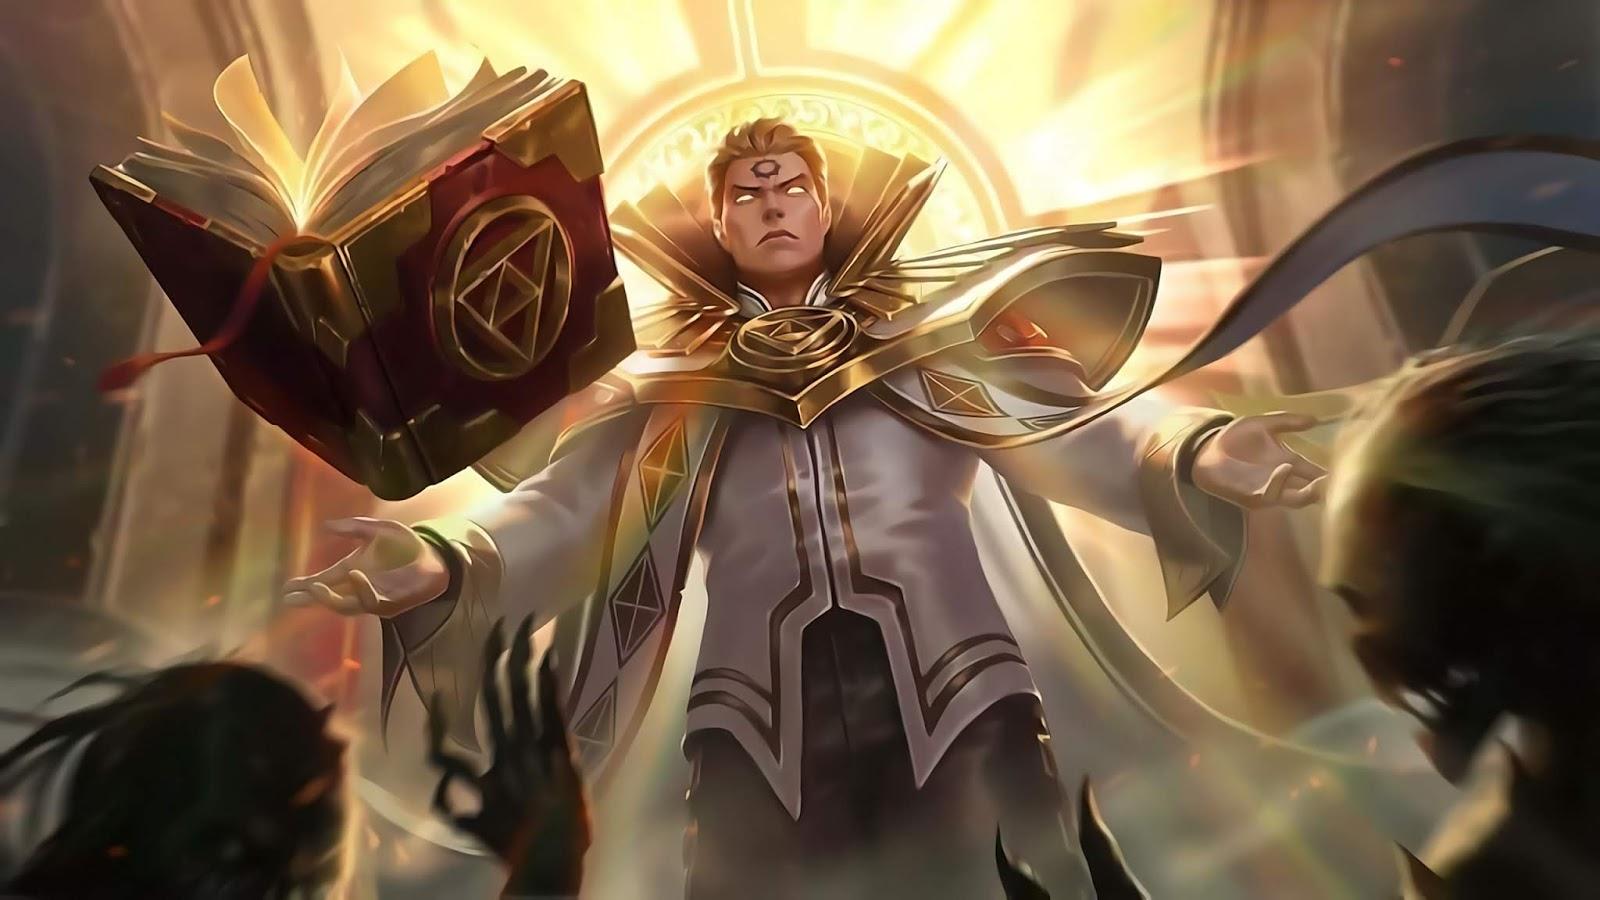 Wallpaper Estes Holy Priest Skin Mobile Legends HD for PC